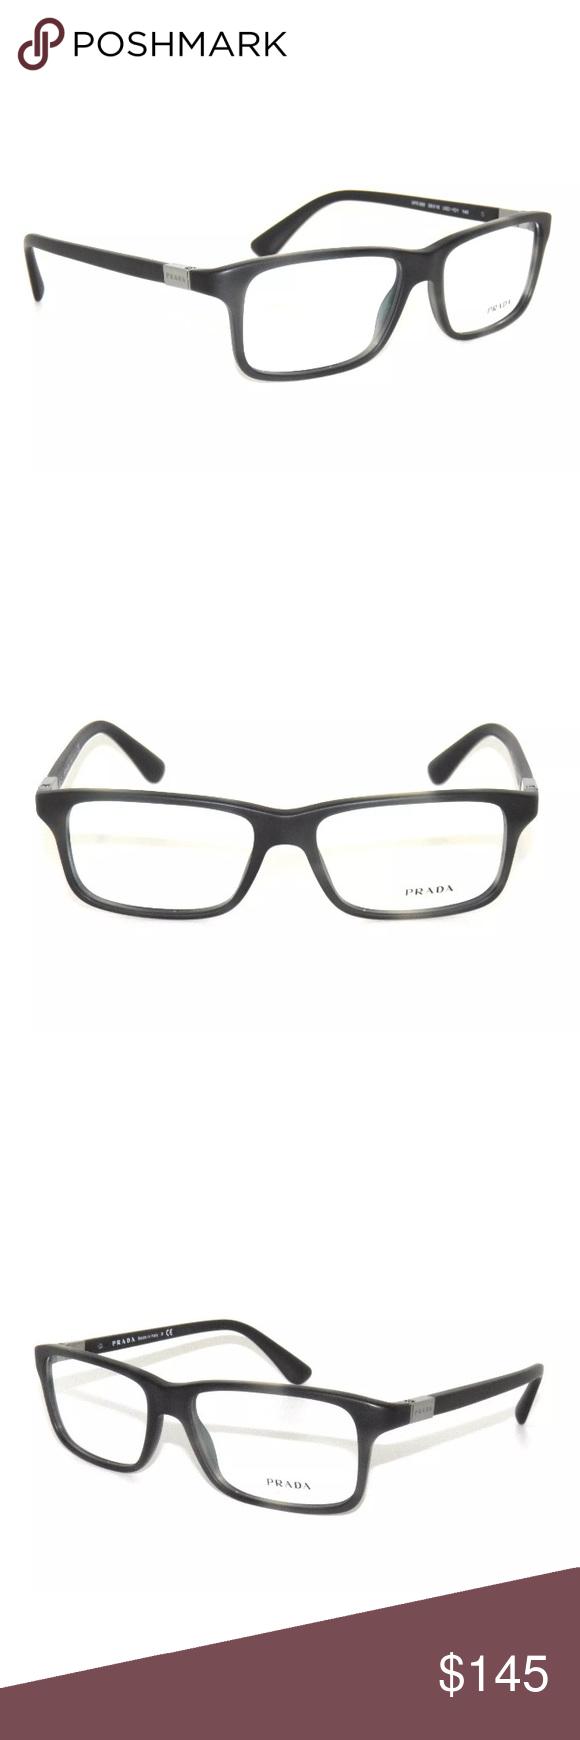 c08055742a38 PRADA White Havana on Black Eyeglasses 06S New Authentic Comes with Prada  case Prada Accessories Glasses